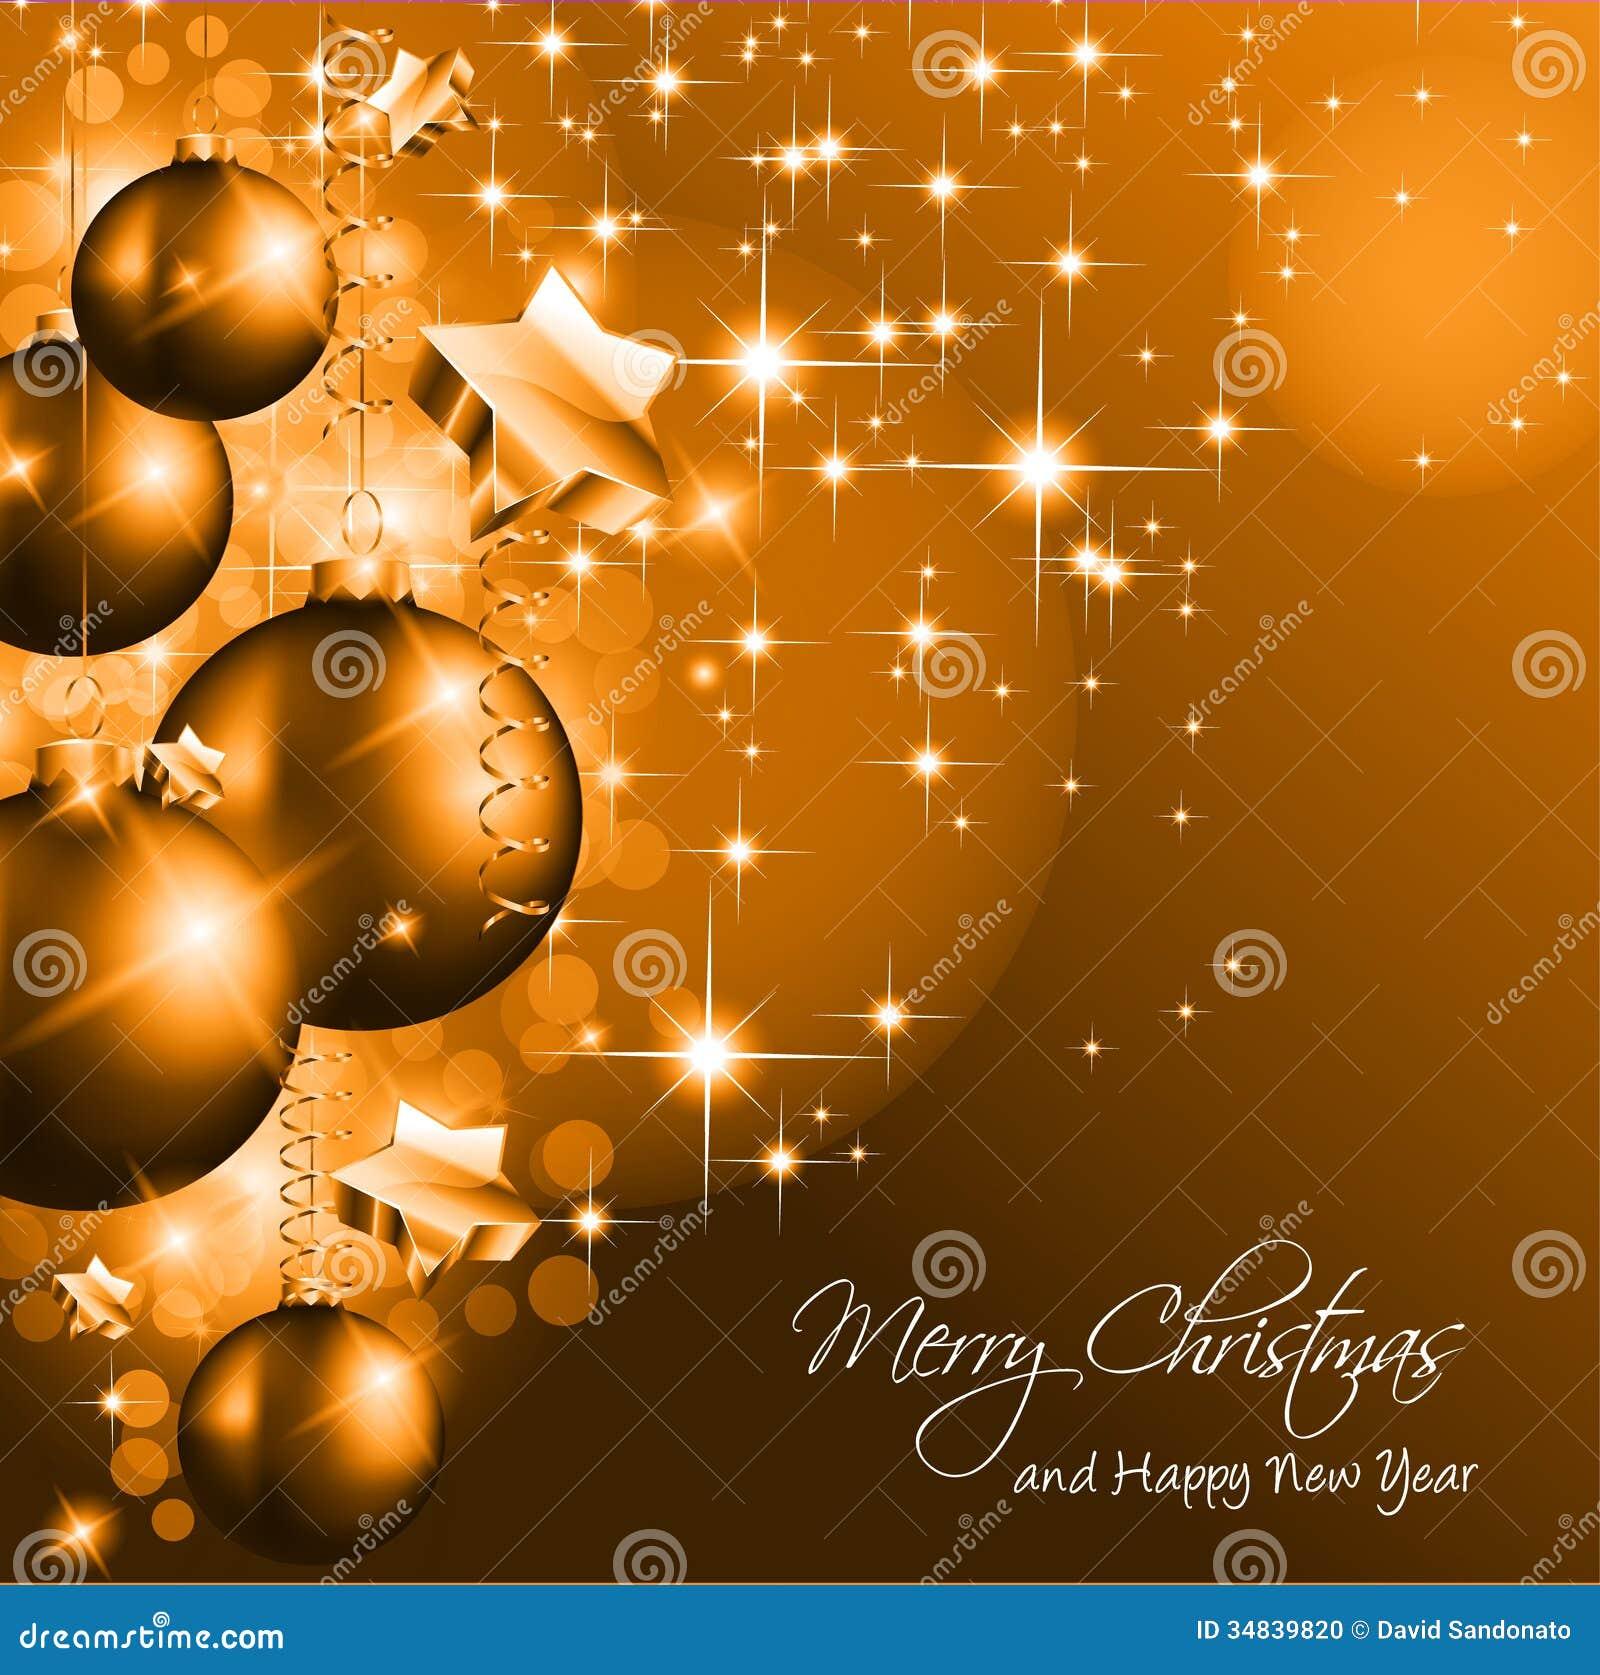 Christmas Invitation Background Free,Invitation.Invitation Card